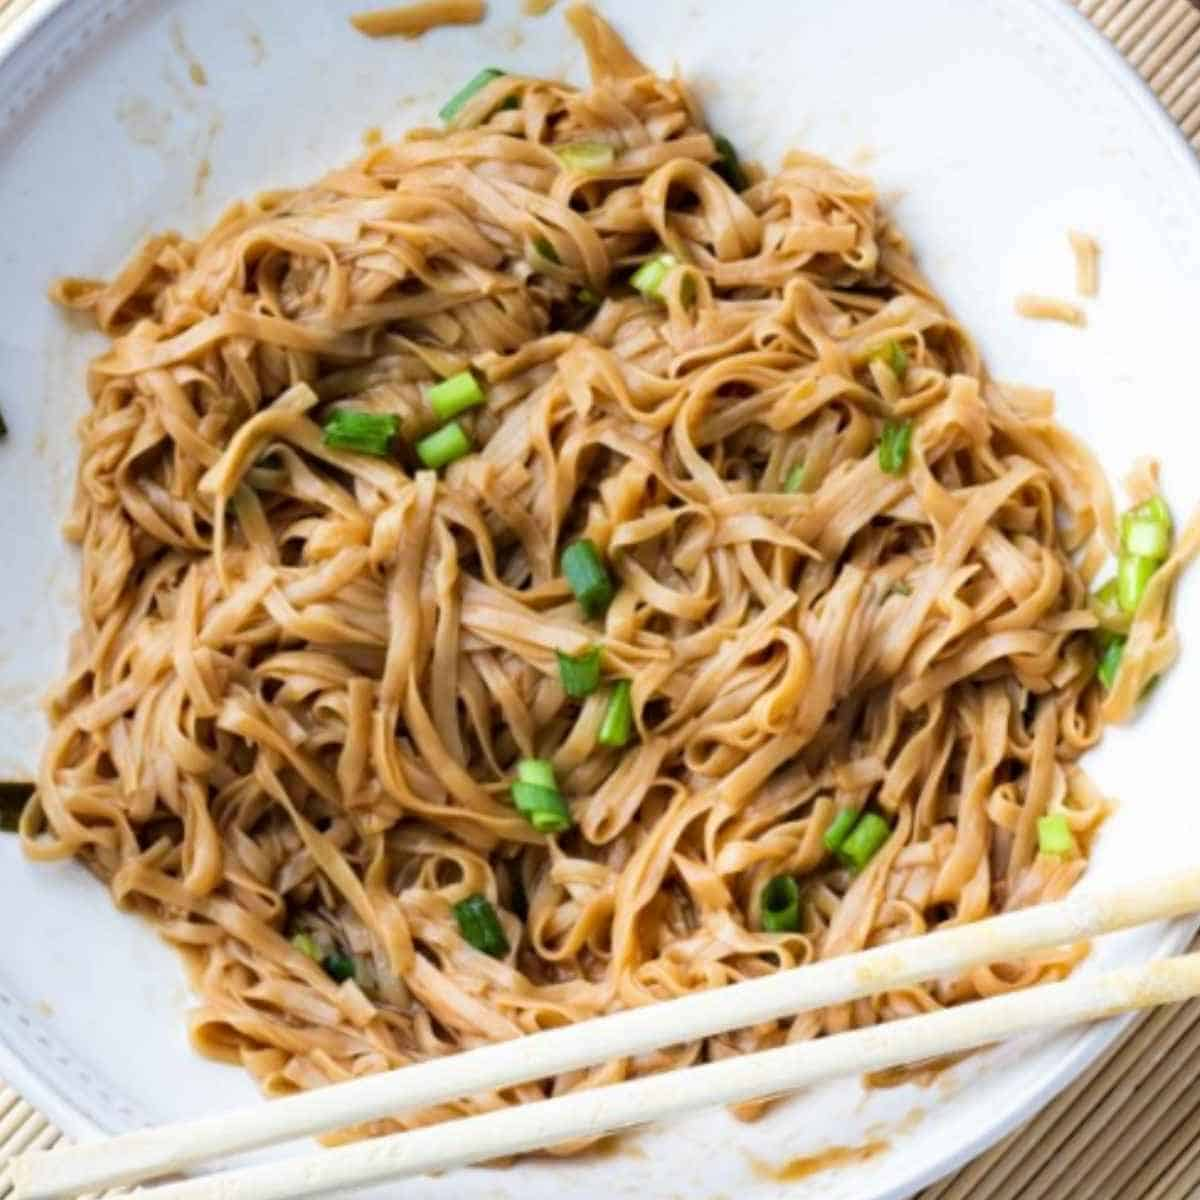 keto low mein - Shirataki: The True Keto Approved Asian Noodle